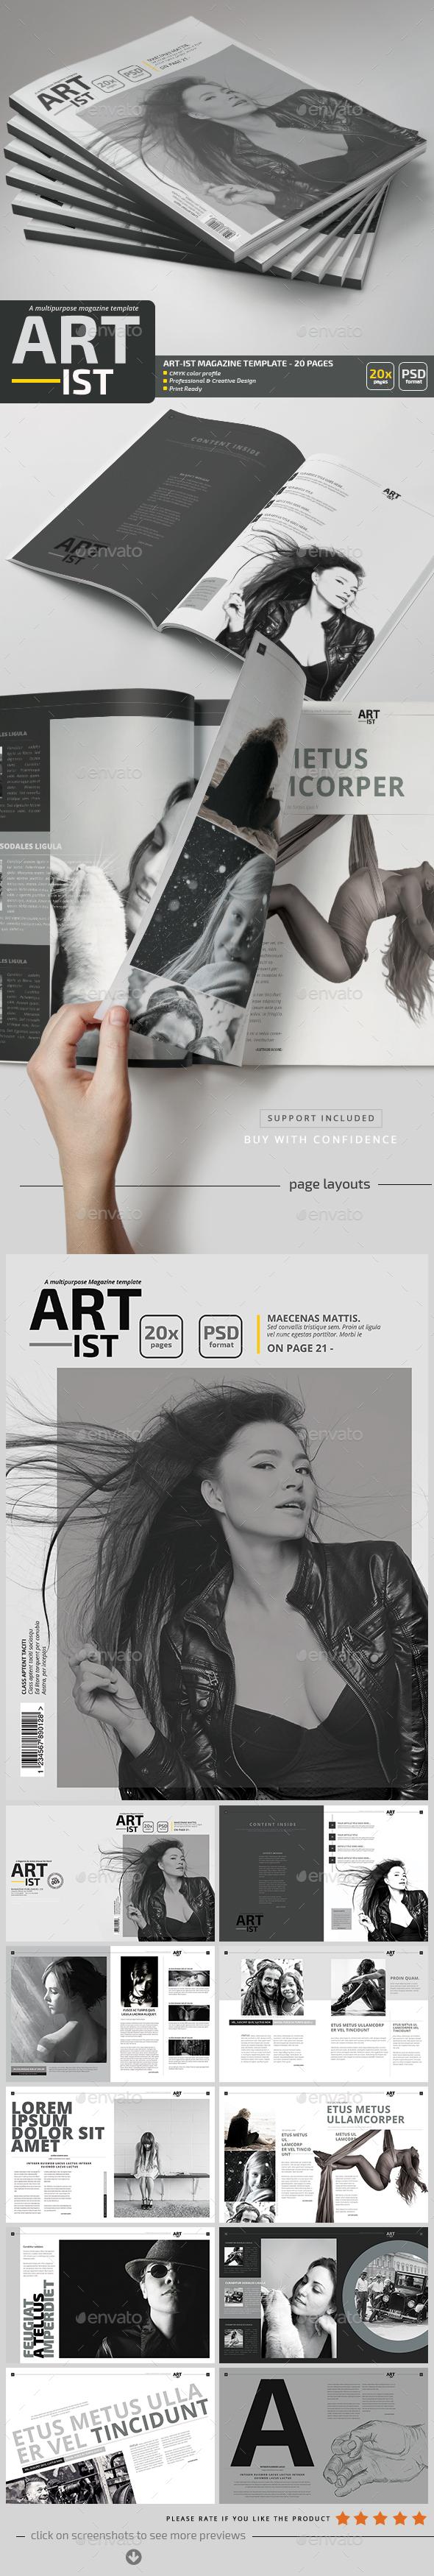 Art-ist Magazine Template V.5 - Magazines Print Templates